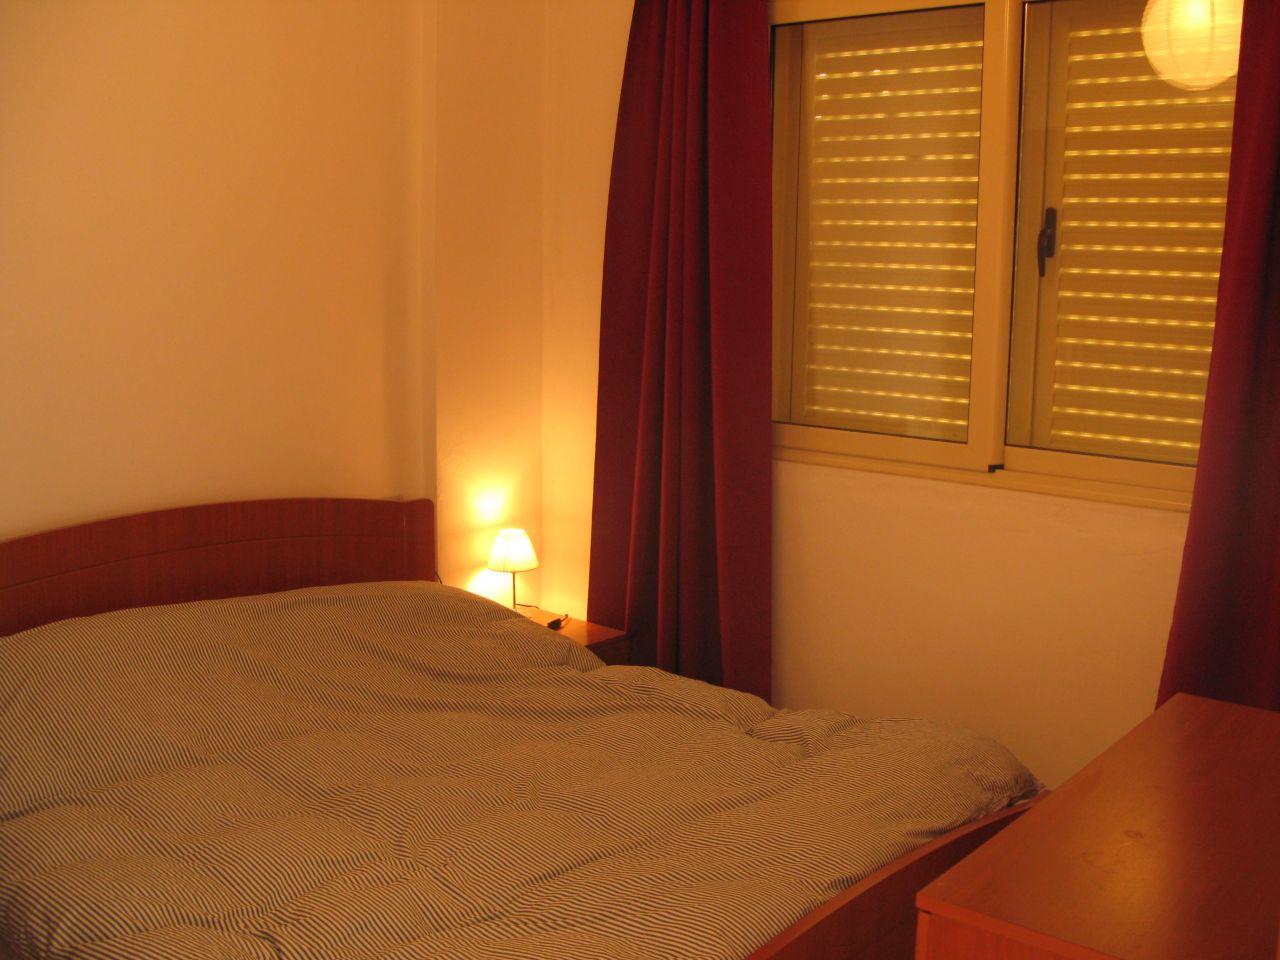 Apartment for Sale in Orikum, coastal village near the city of Vlora, in Albania.